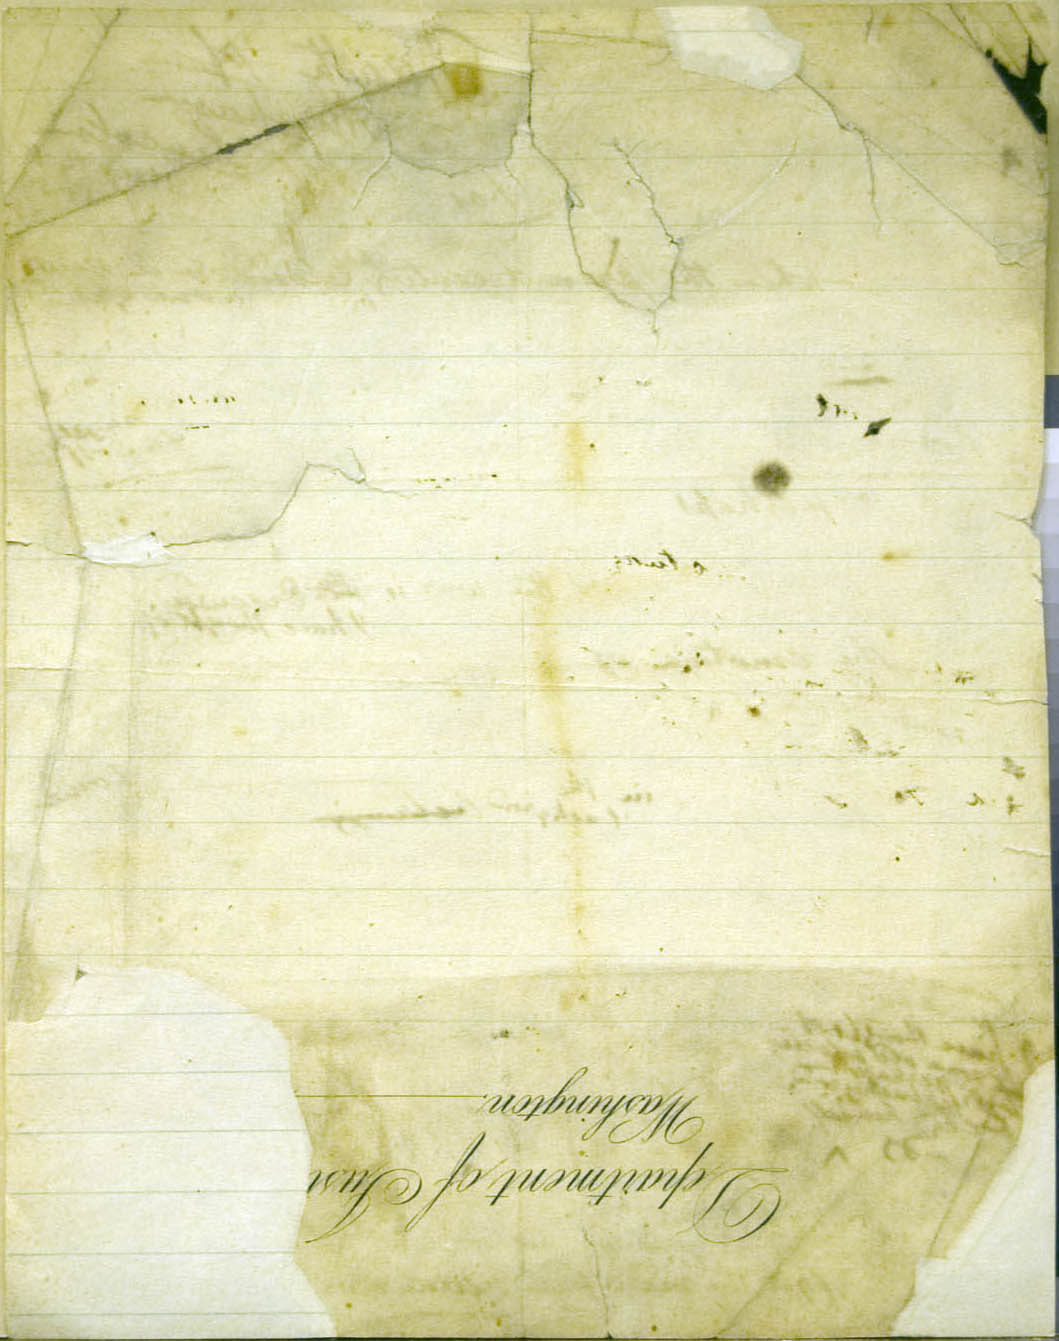 death of abraham lincoln walt whitman pdf